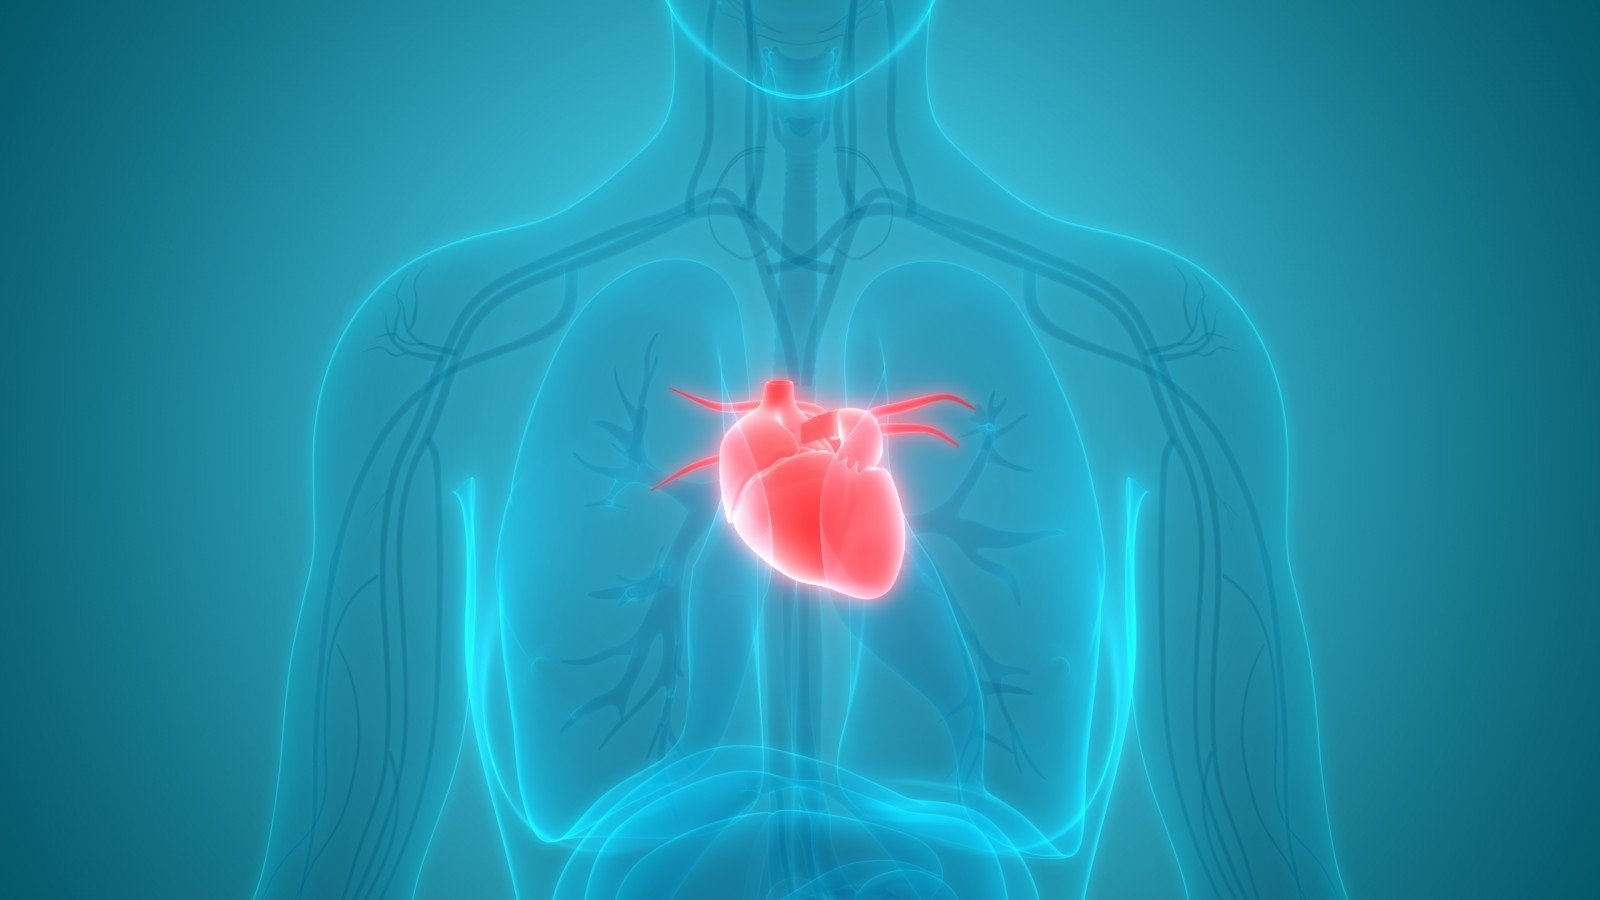 širdies sveikatos supratimo juosta hipertenzijos centras